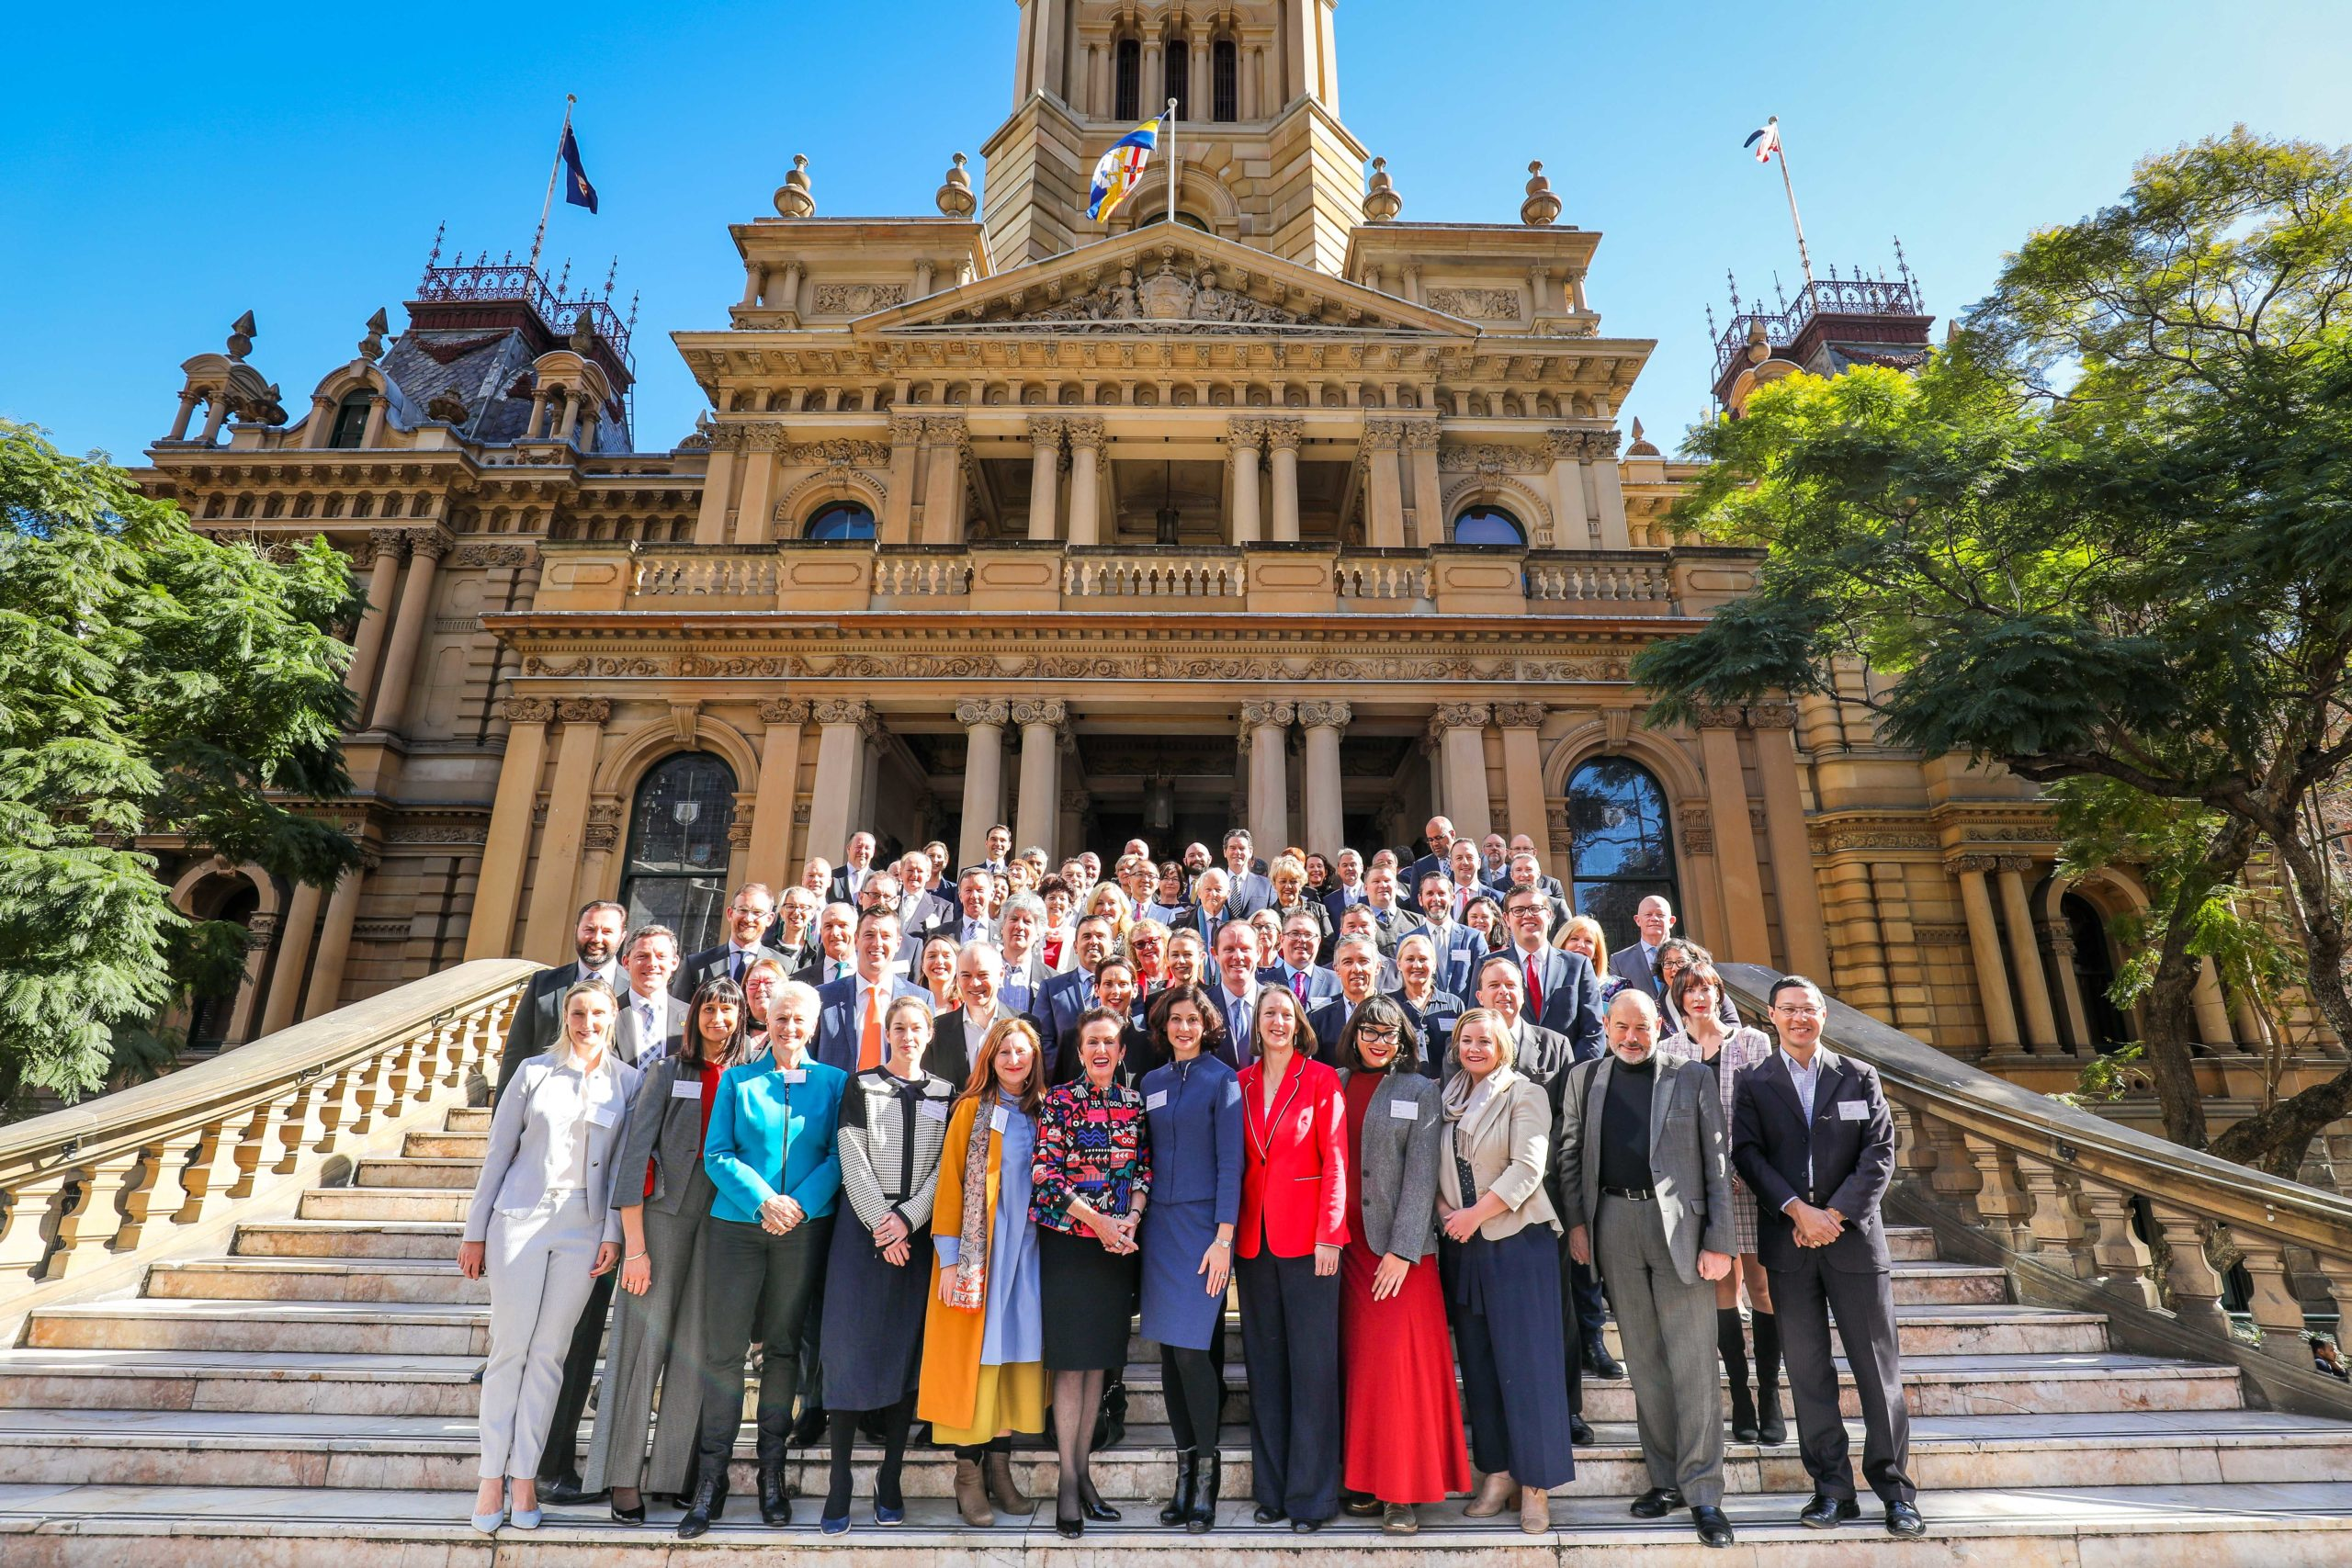 Sydney's resilience